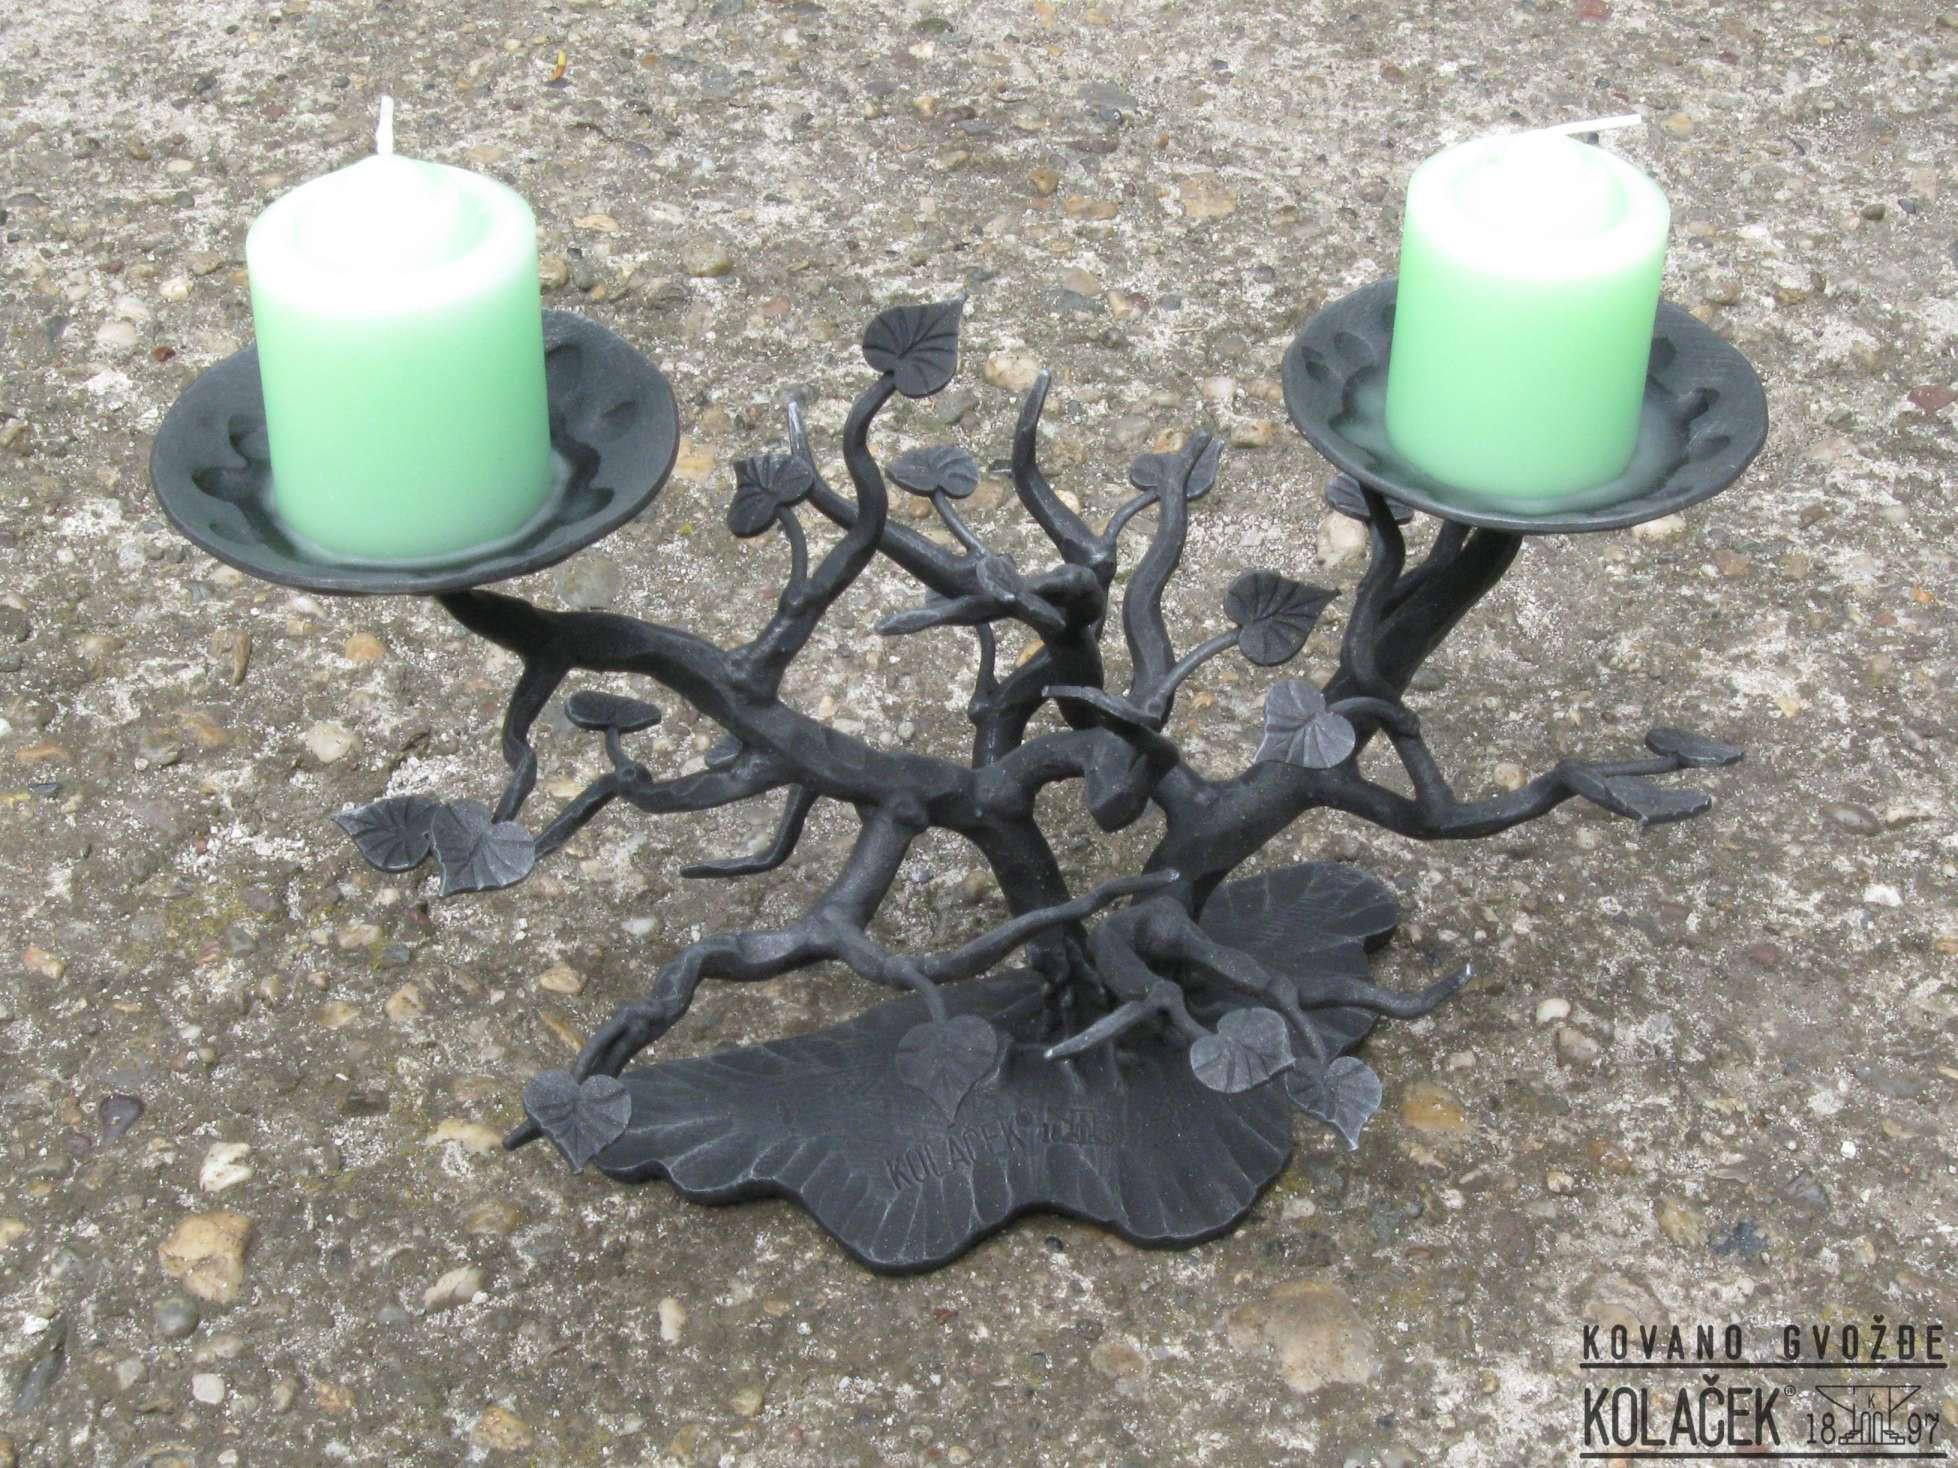 clear vase filler bulk of crystal candle holder new for candle holder bulk candle holders for crystal candle holder best of for candle holder wrought iron kolacek 1897